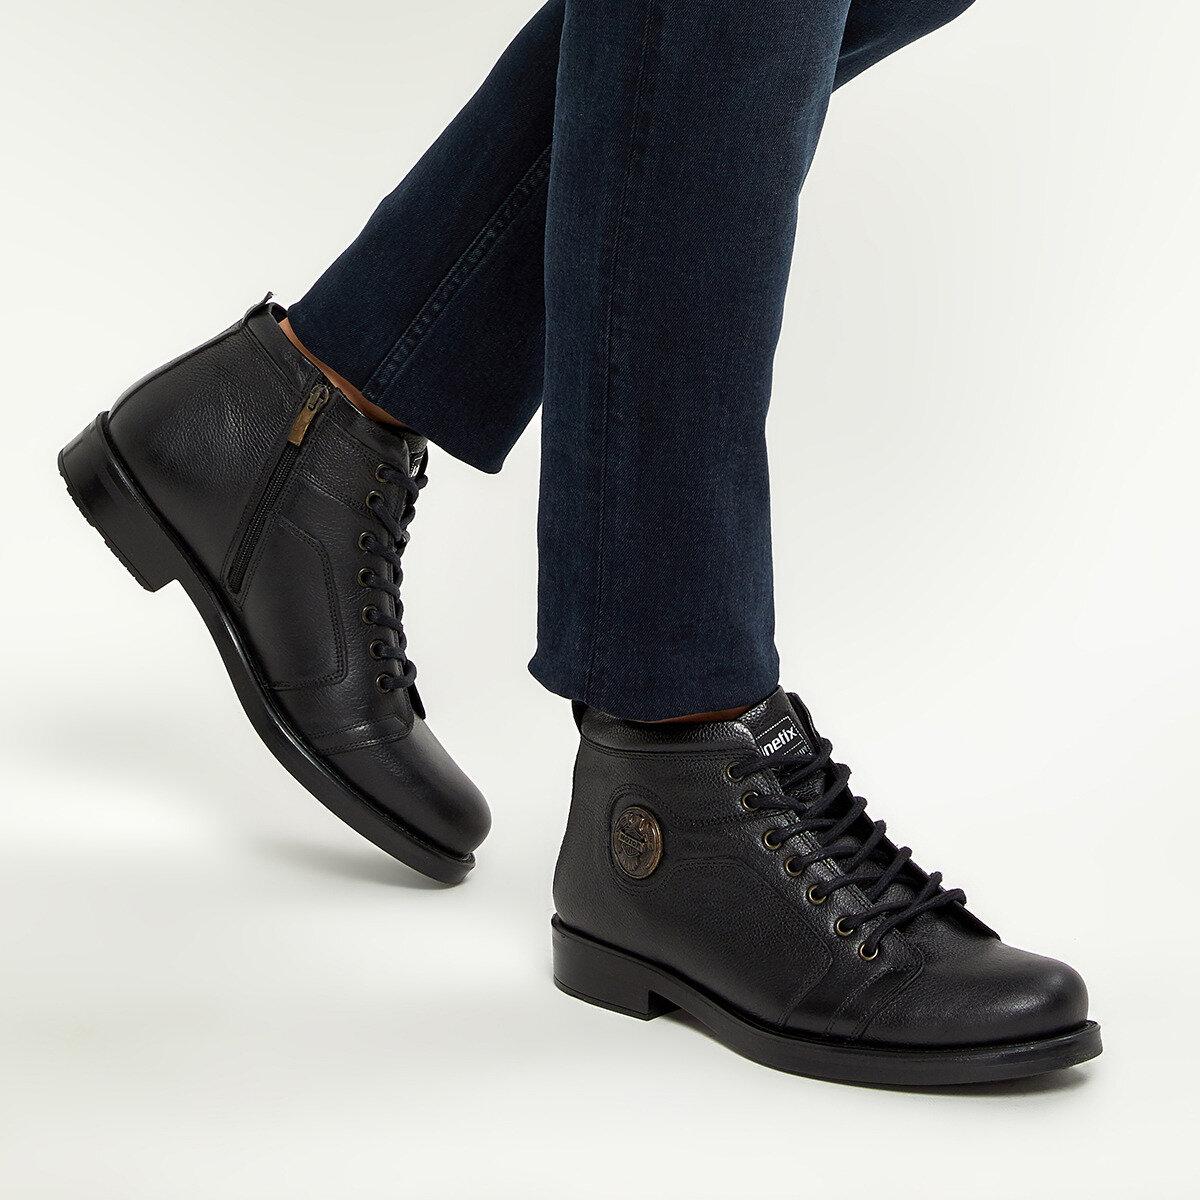 FLO KOMPAN Black Men Boots KINETIX